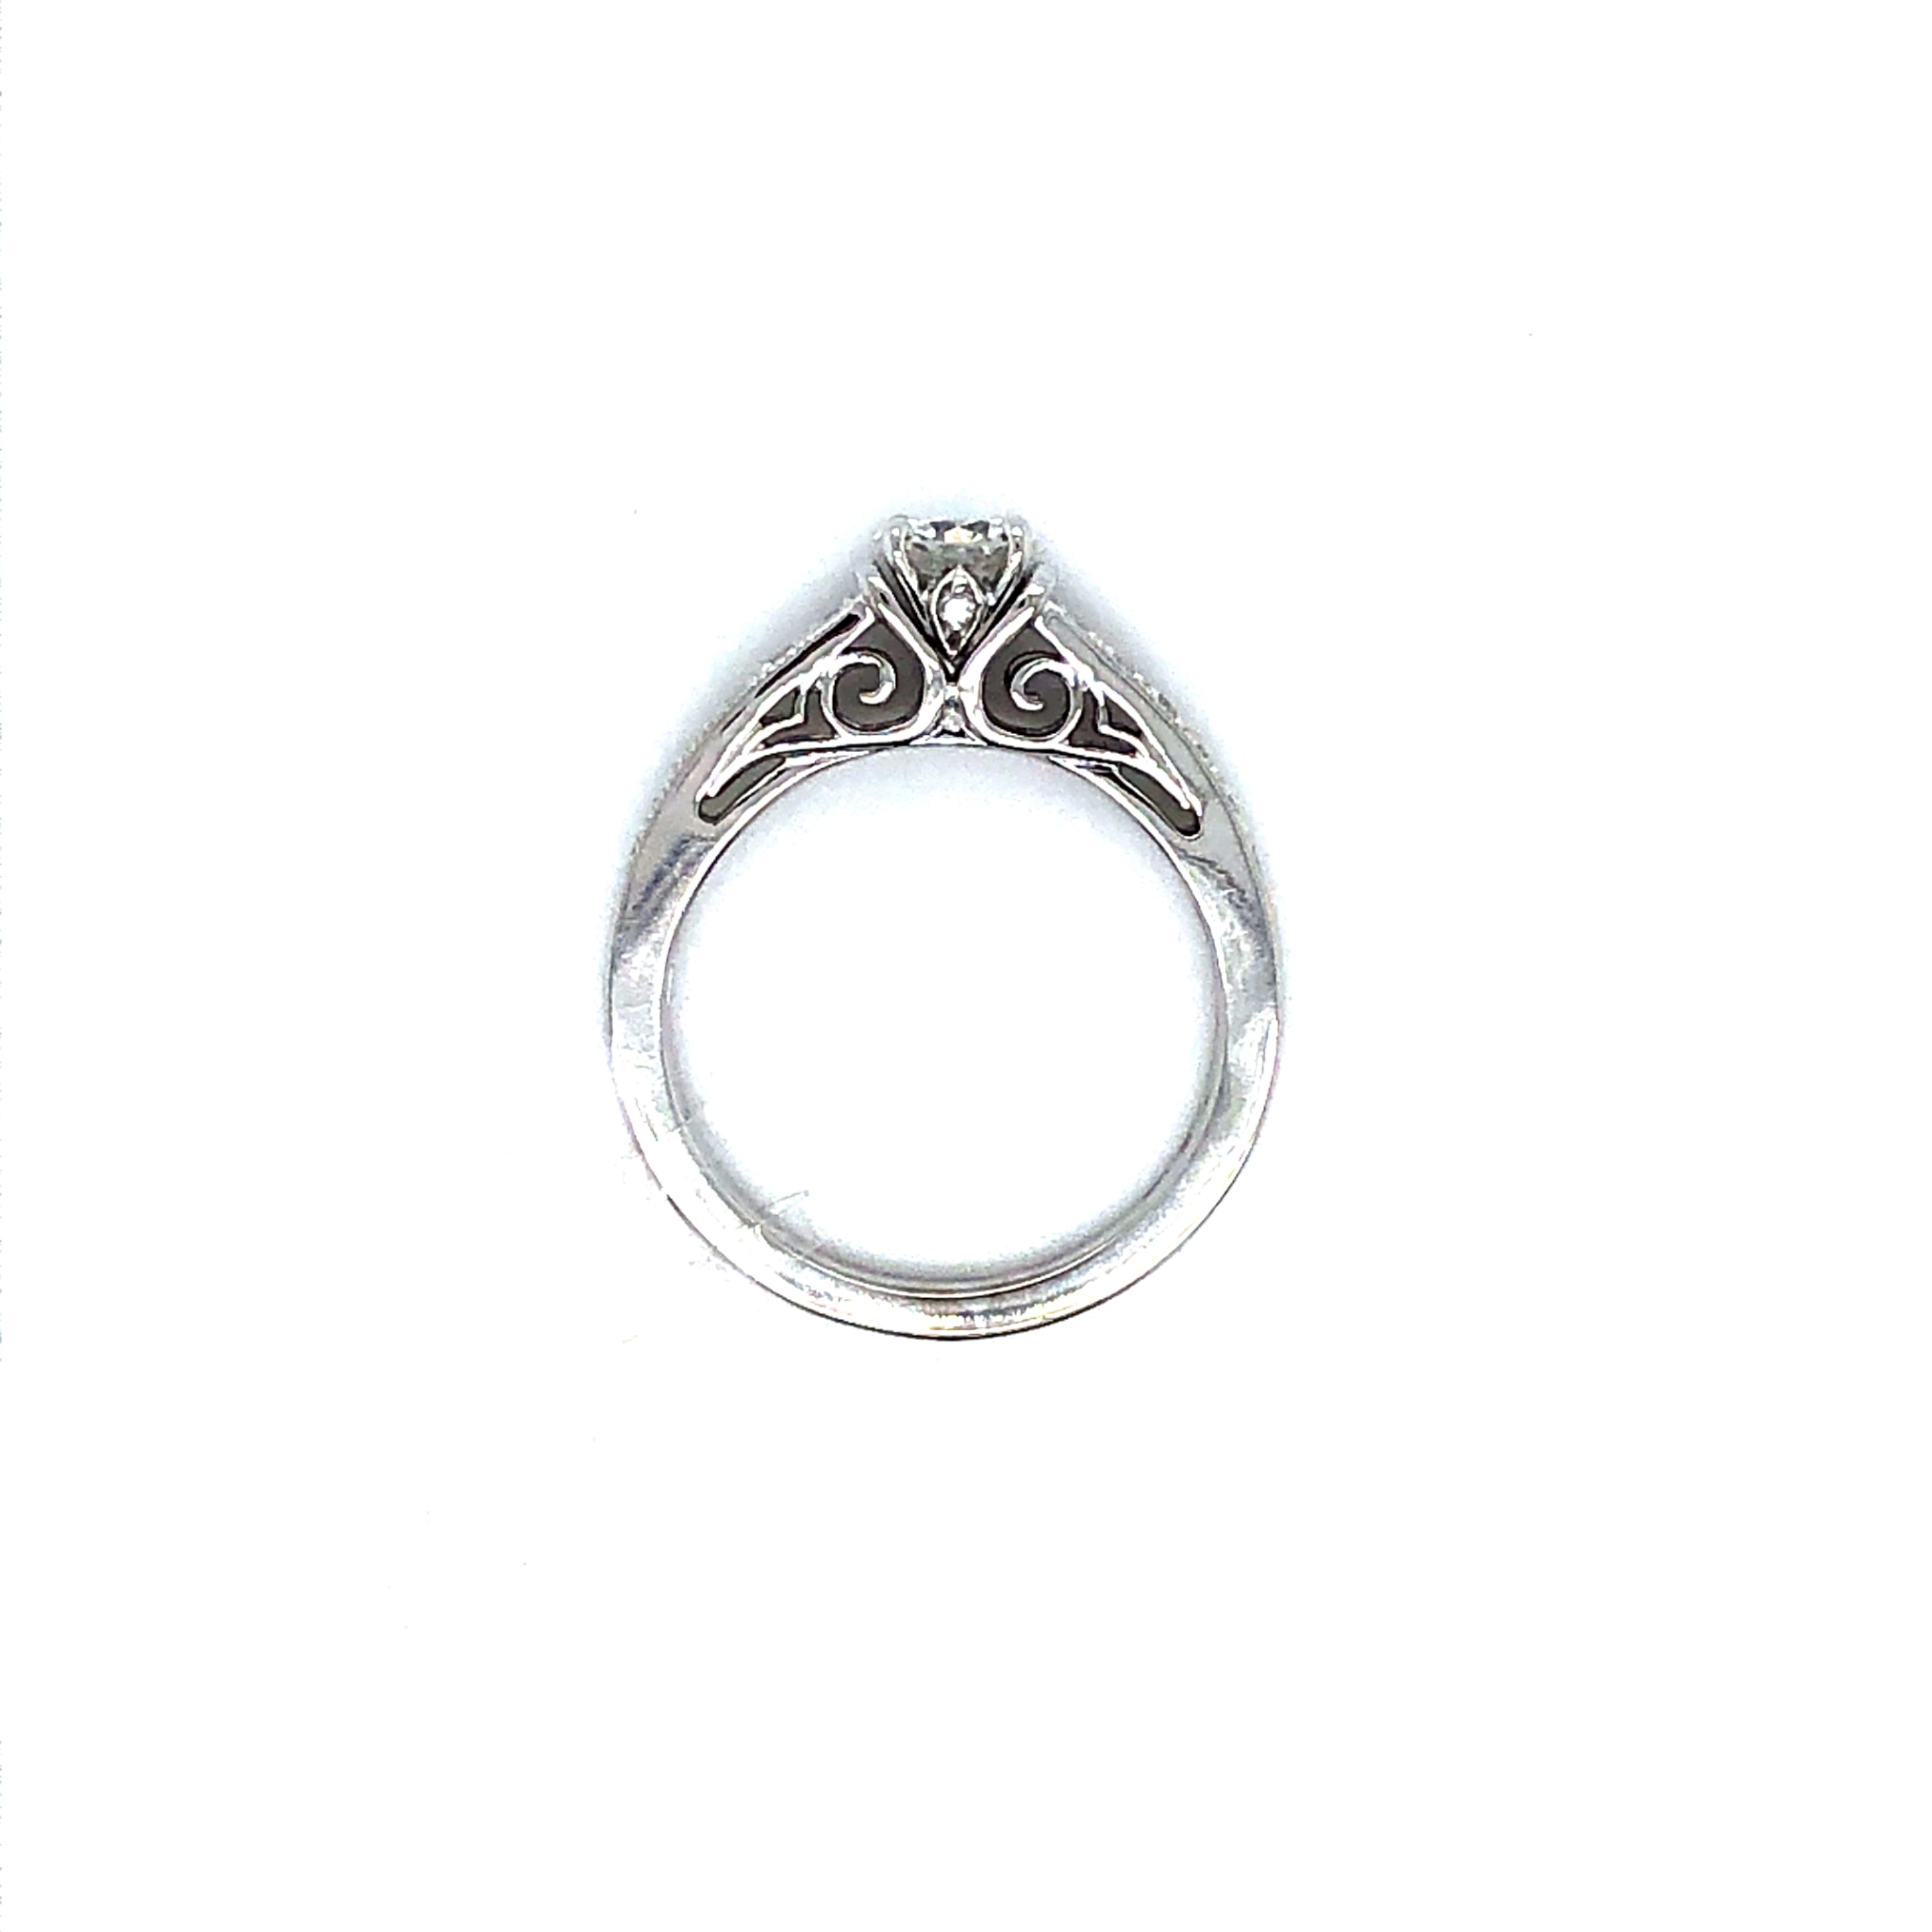 Diamond Semi-Mount Ring 001-140-00381 14KW Wood Dale